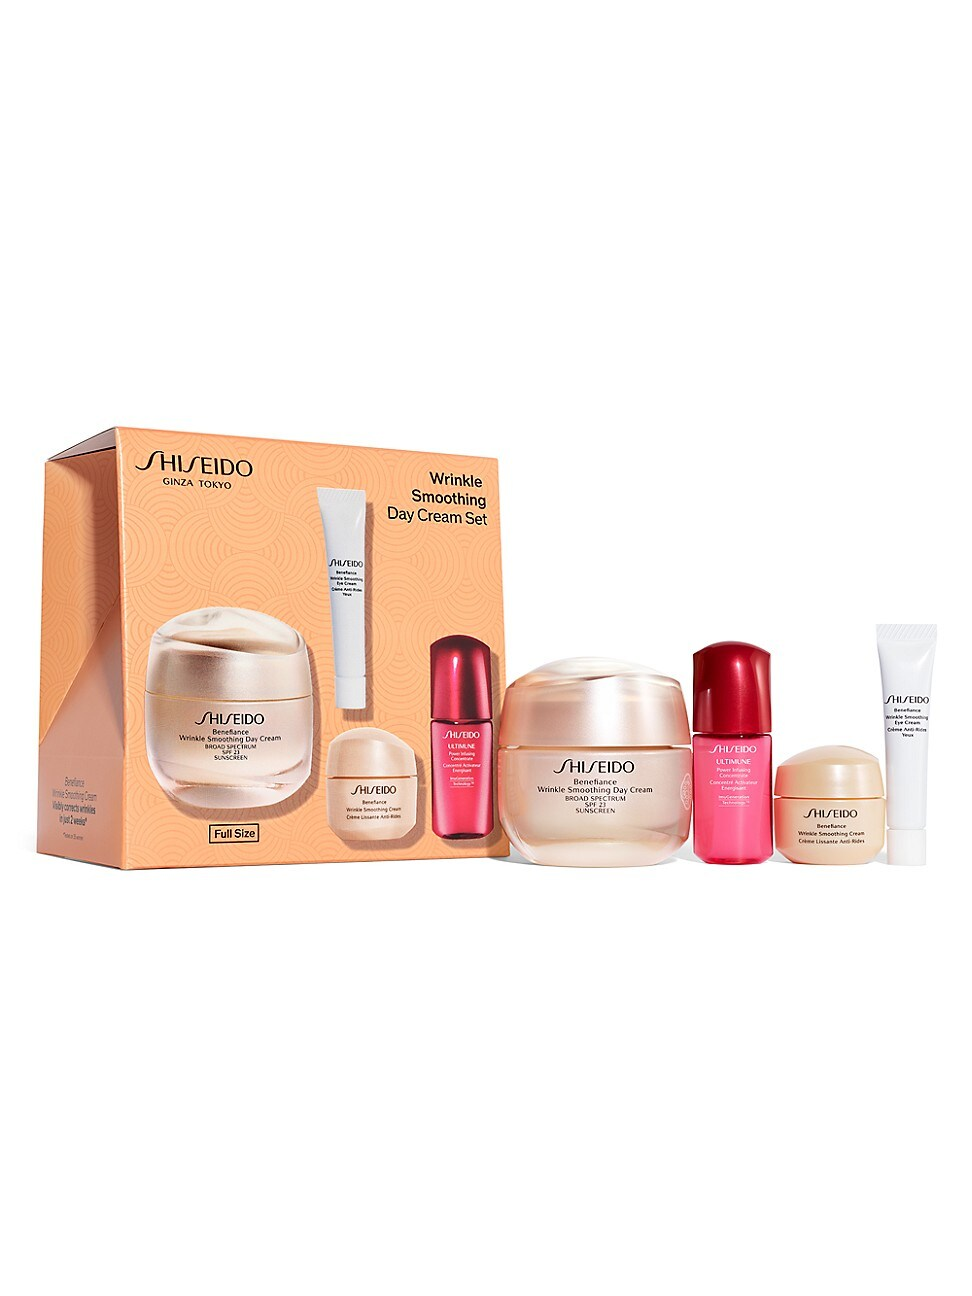 Shiseido BENEFIANCE WRINKLE SMOOTHING DAY CREAM FOUR-PIECE SET